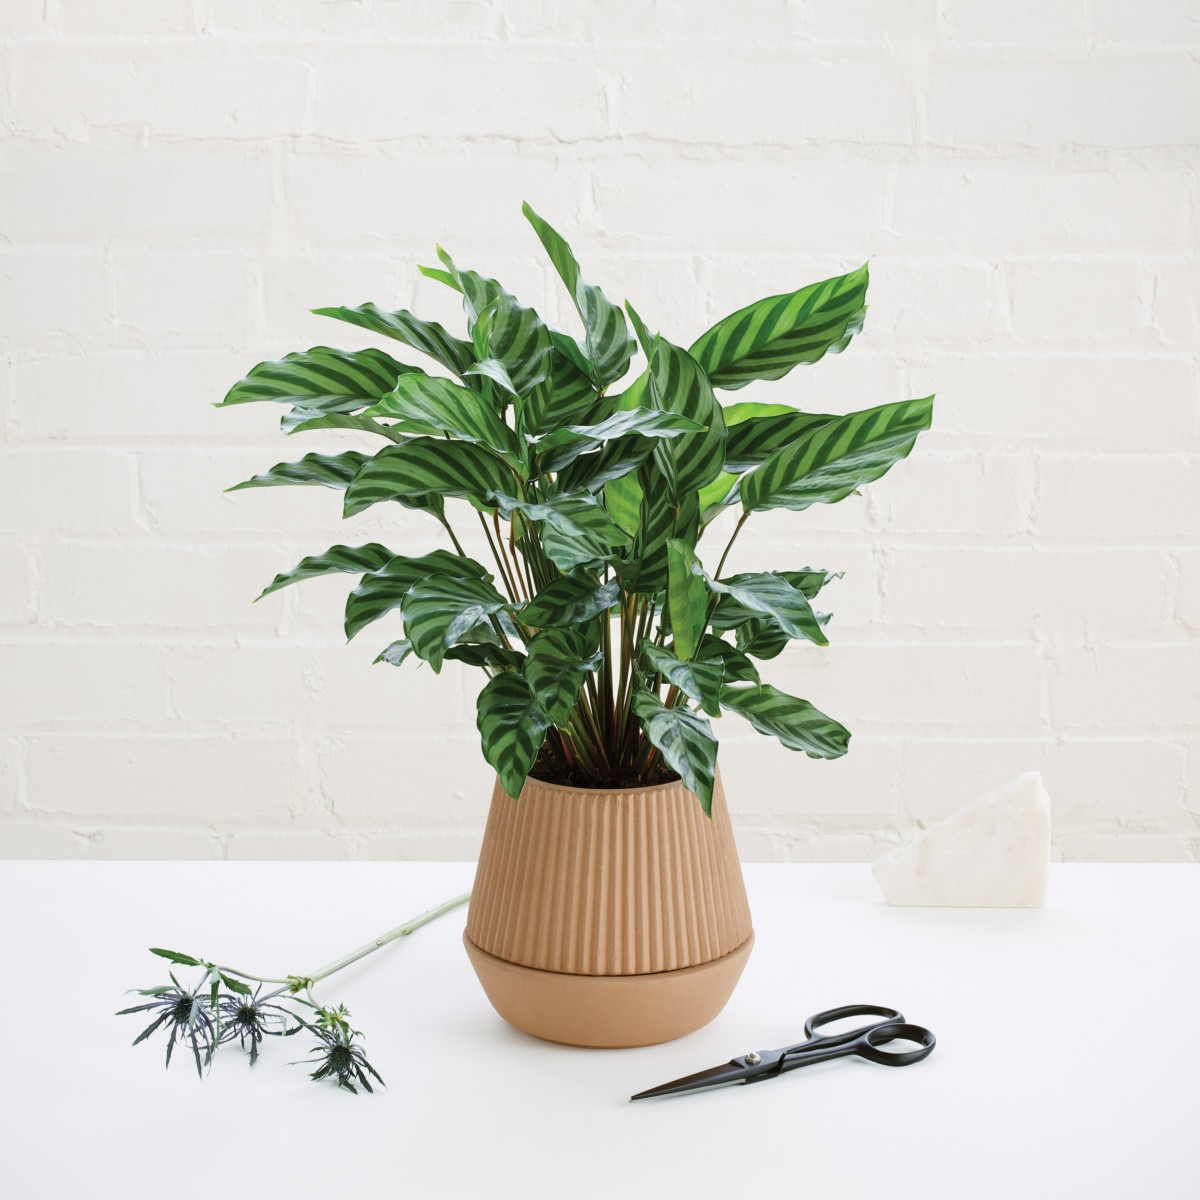 880104-745-pleated-planter-001_3.jpg